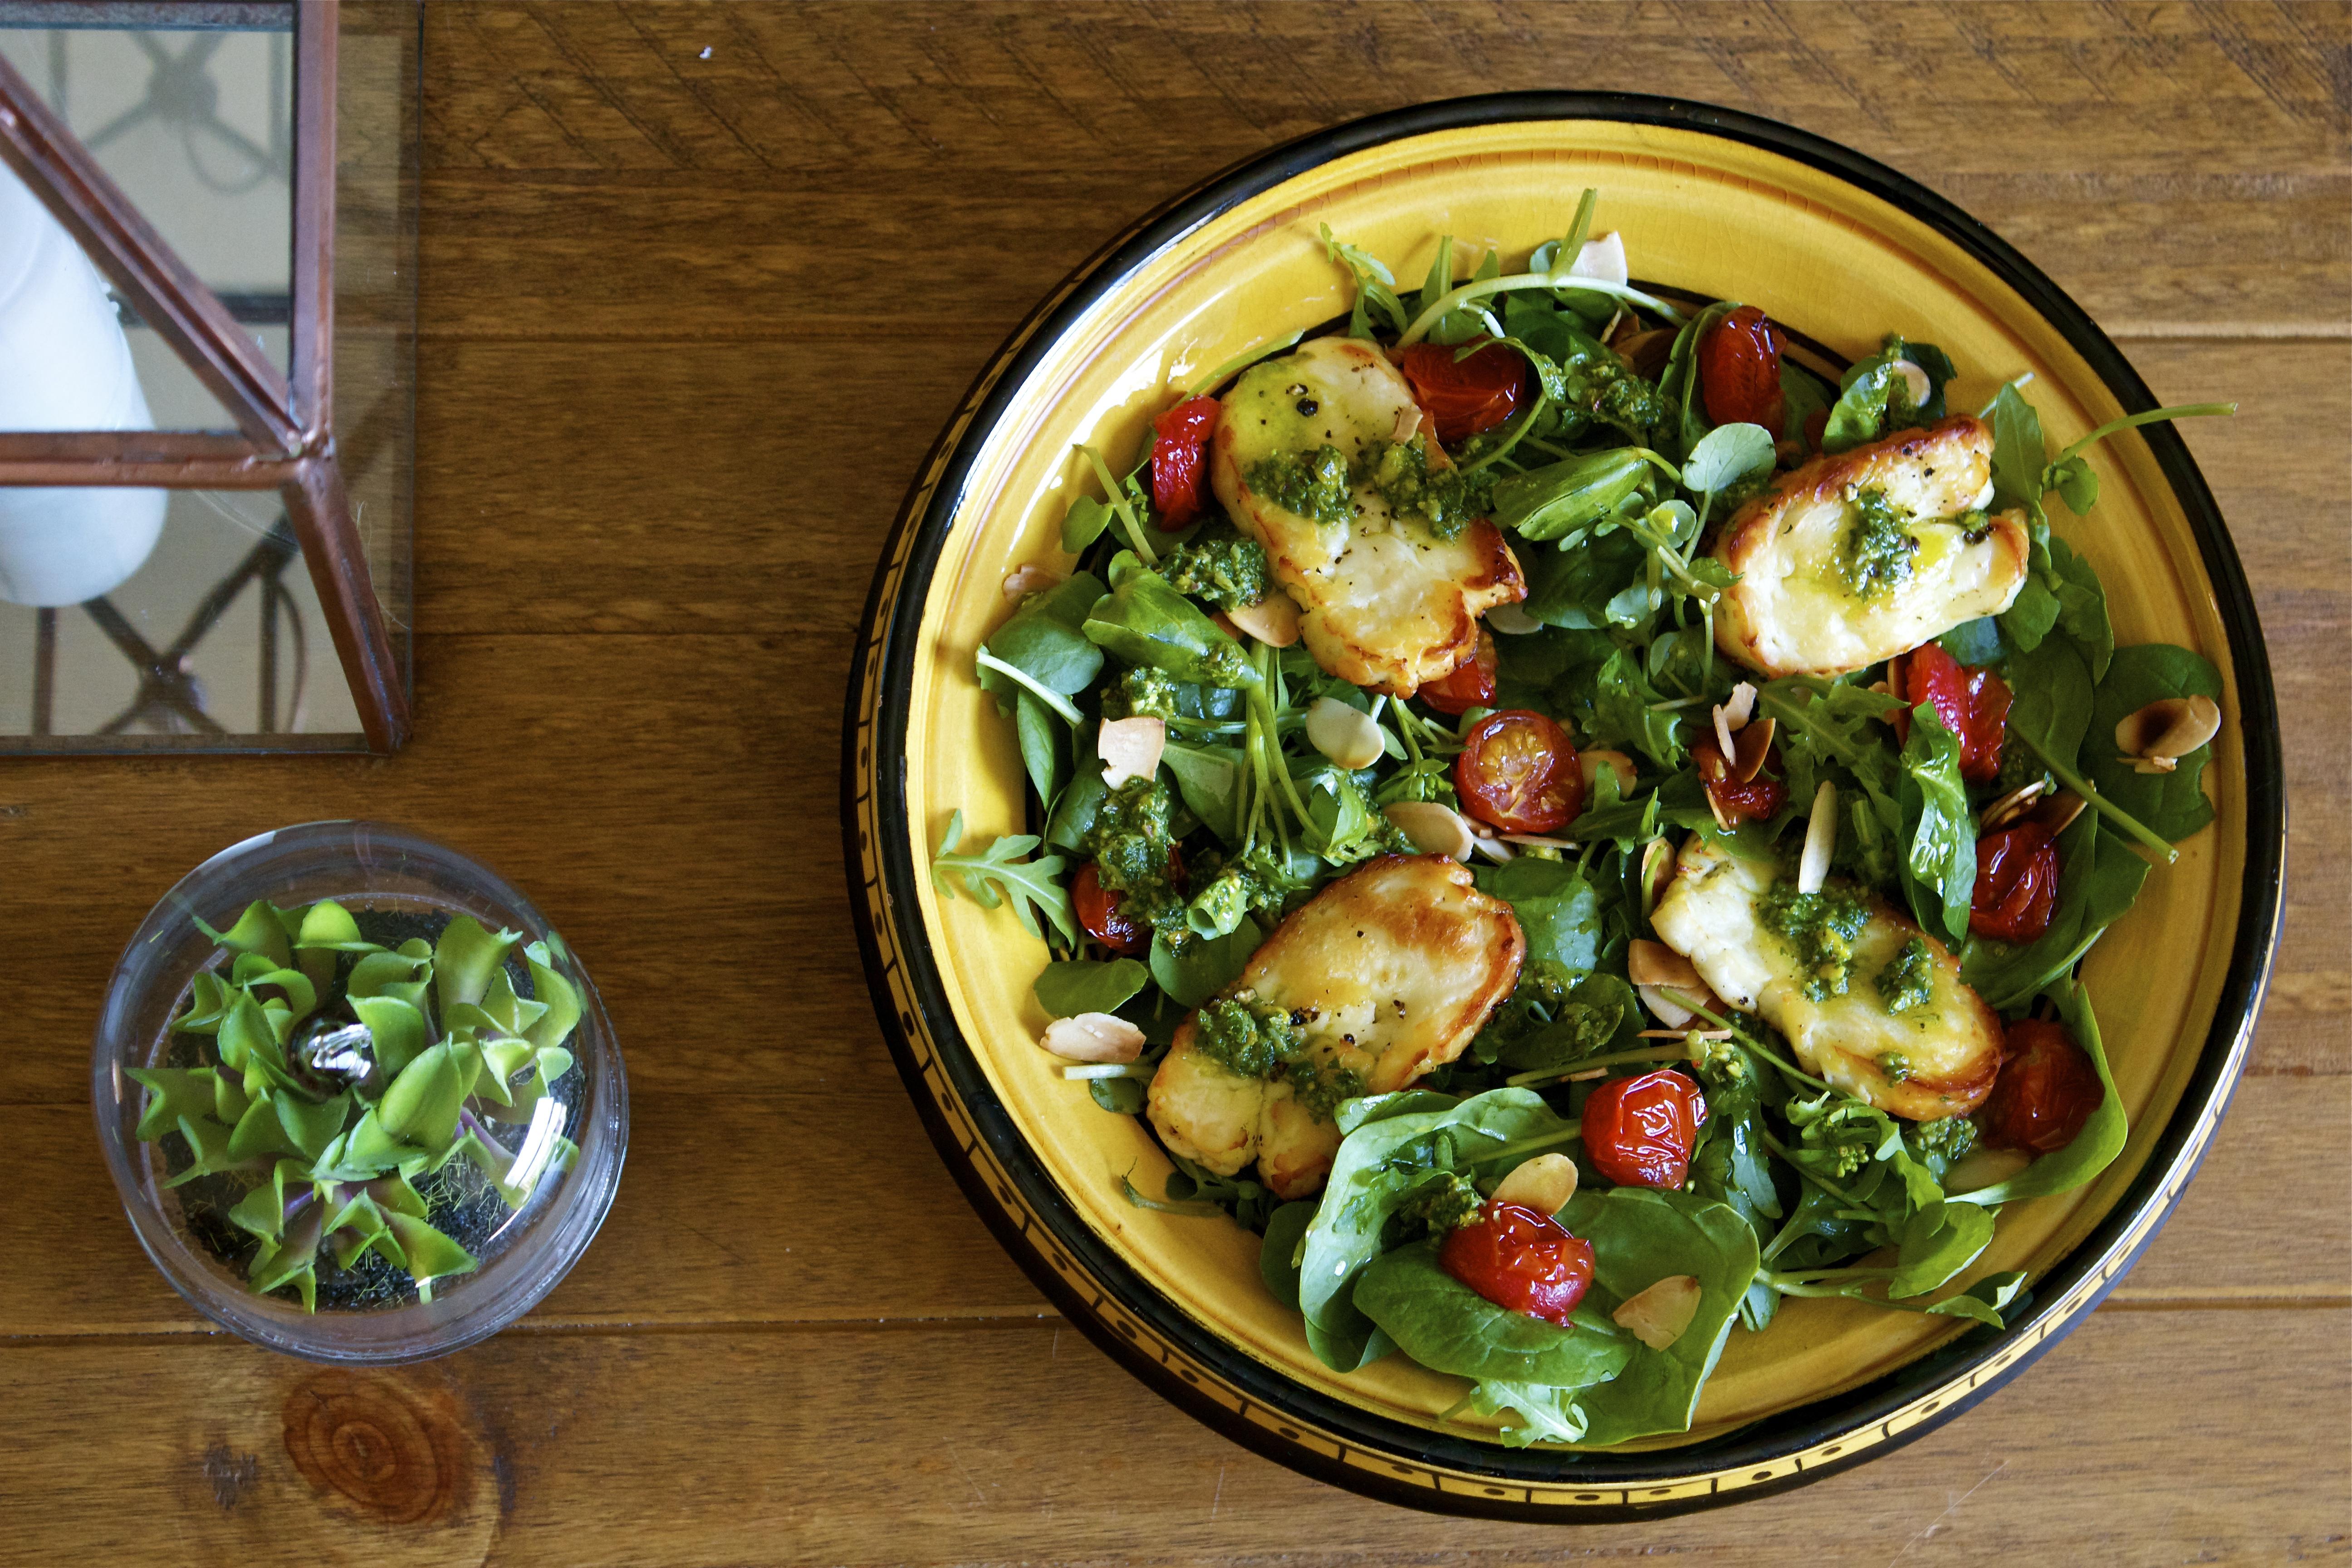 Gluten Free, Halloumi, Tomato, Salad, Pesto Vinaigrette